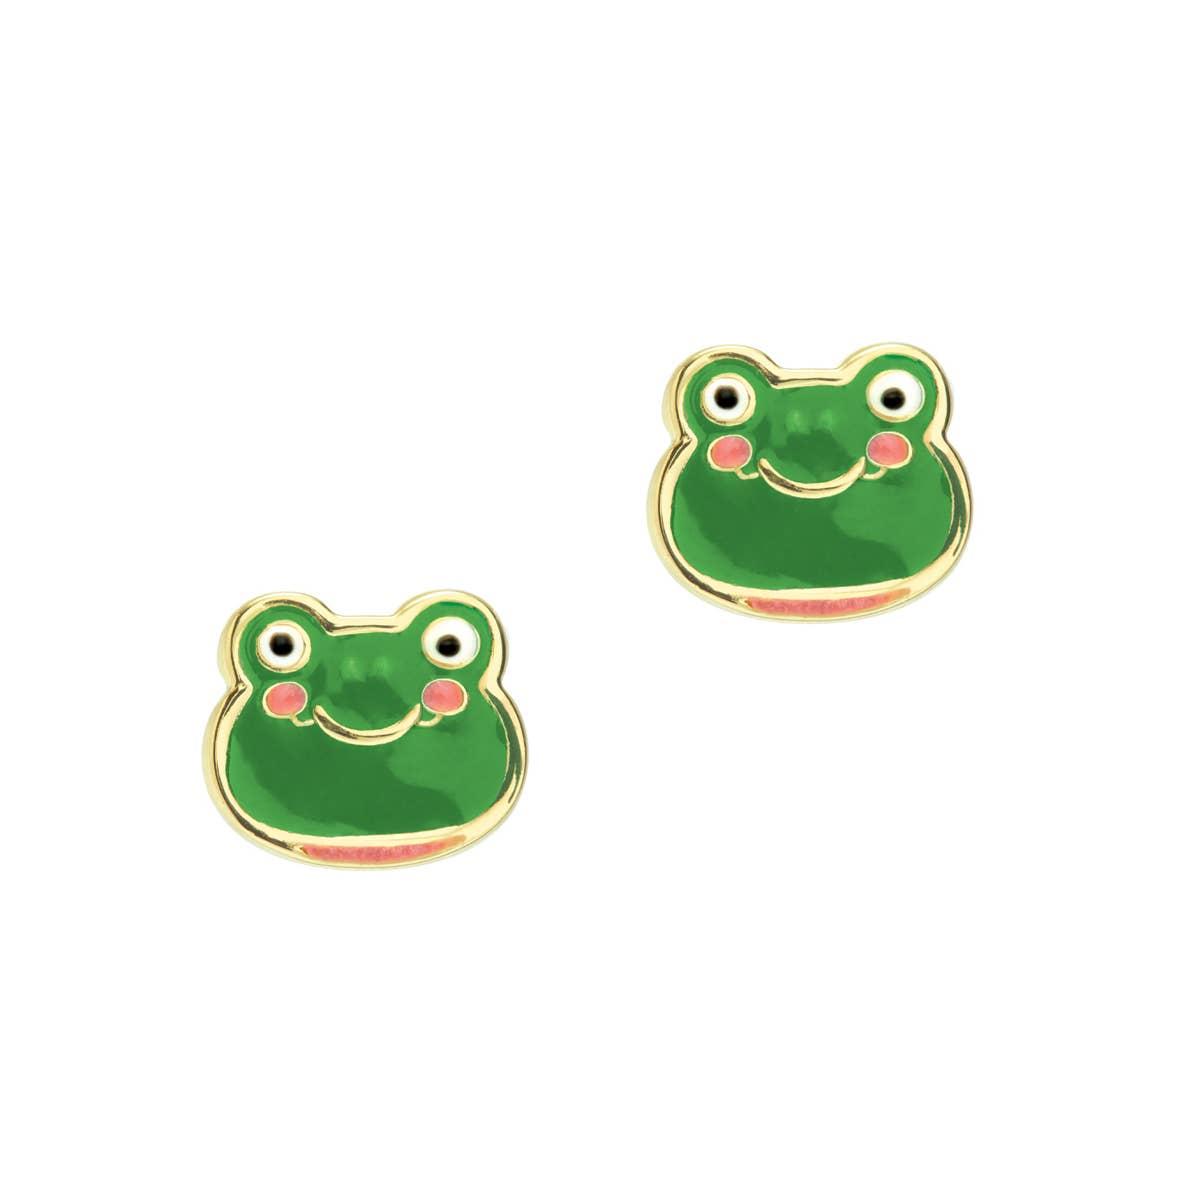 Fancy Frog Cutie Studs | Trada Marketplace